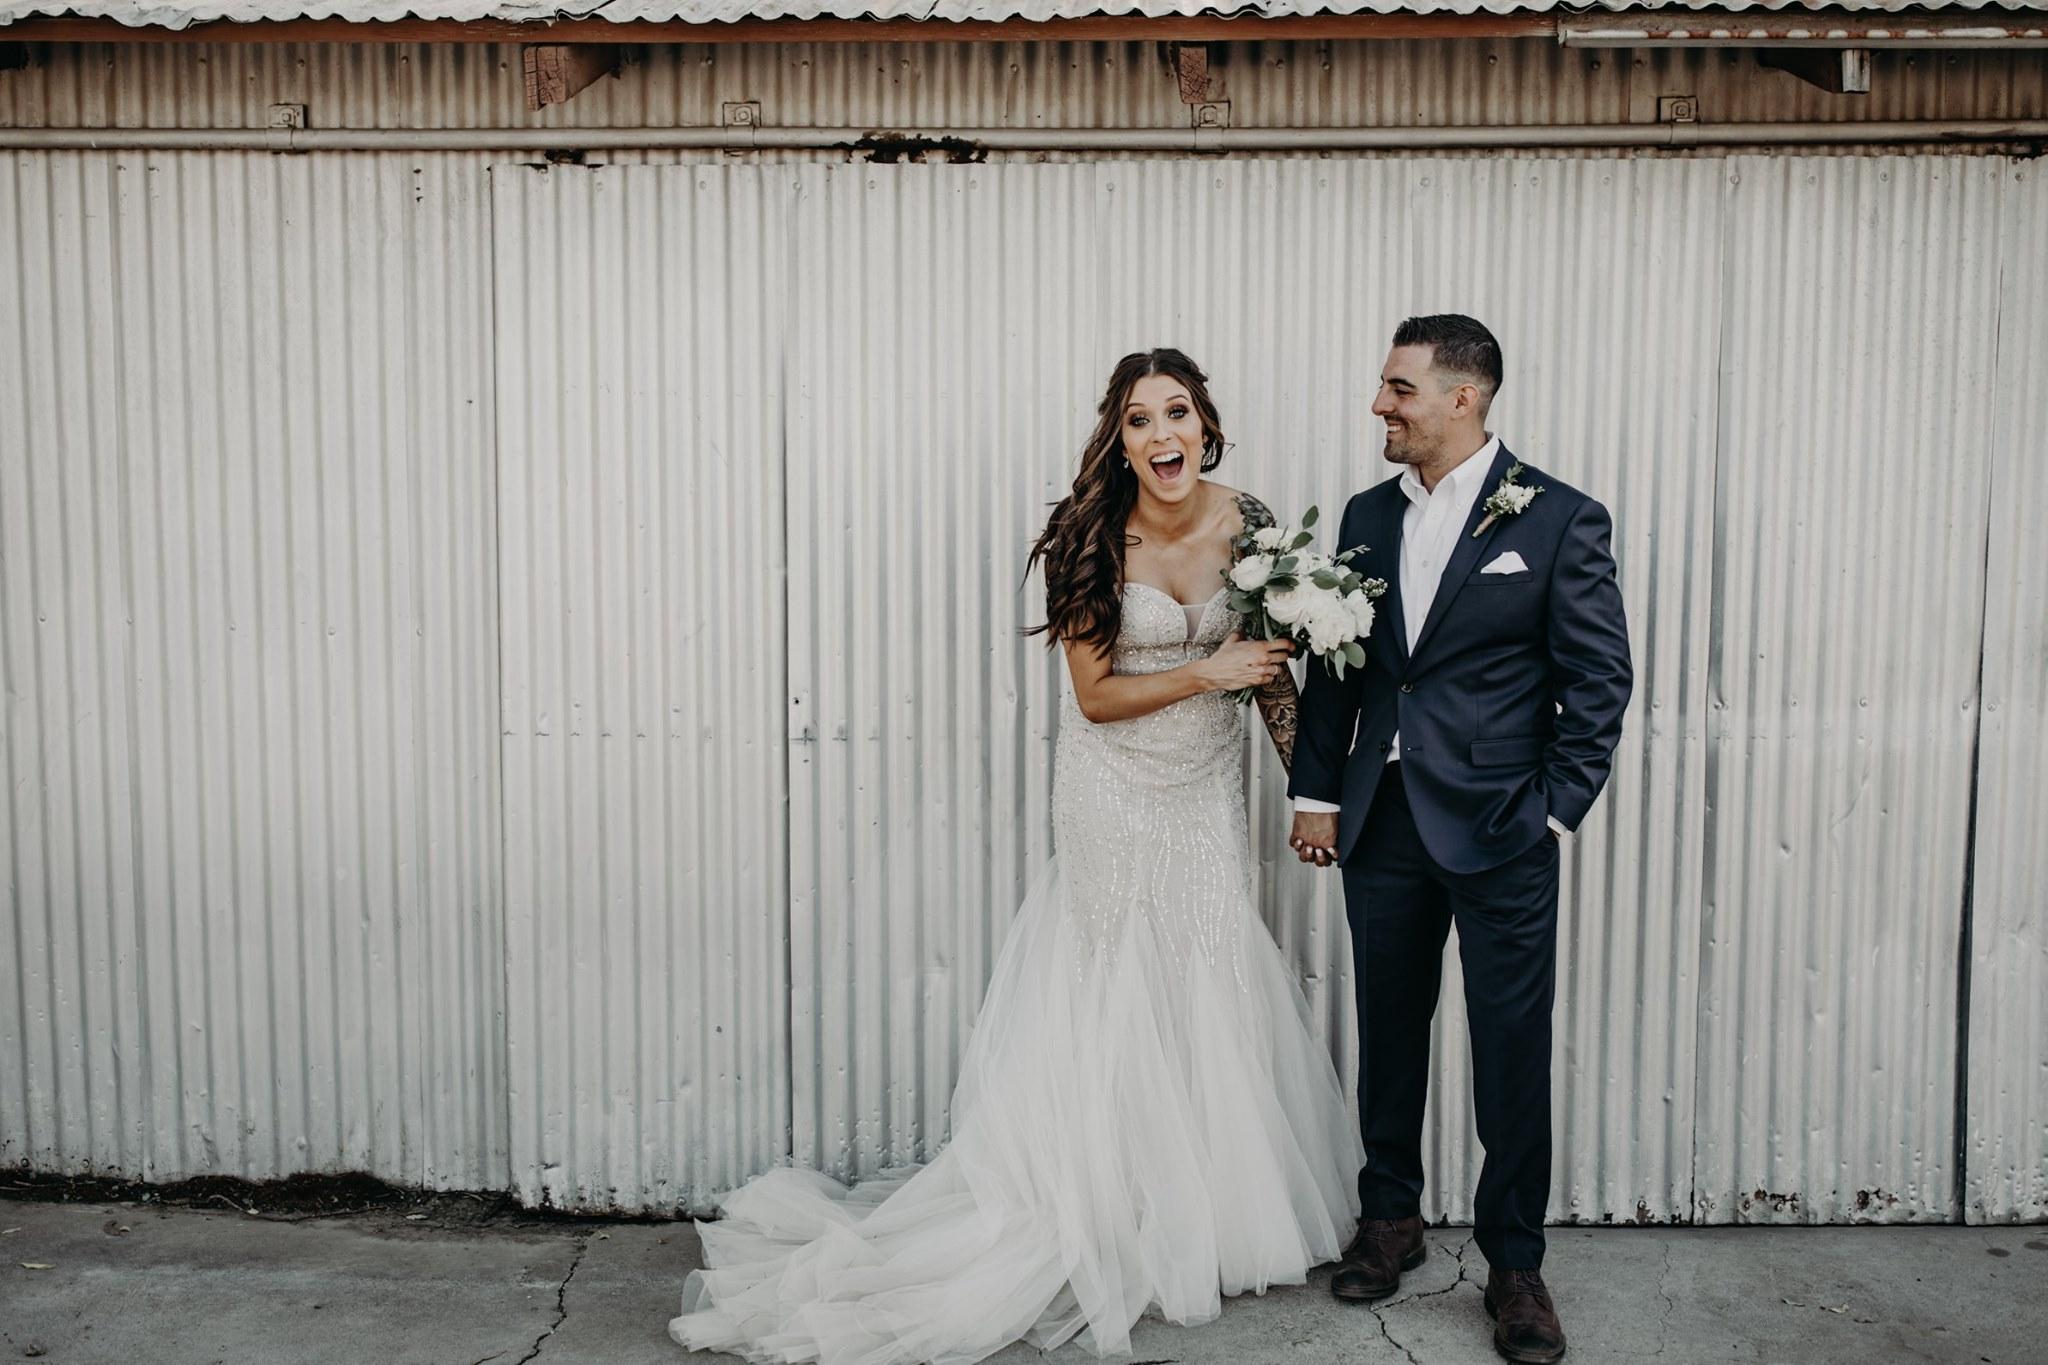 Rustic Country Wedding Outdoor